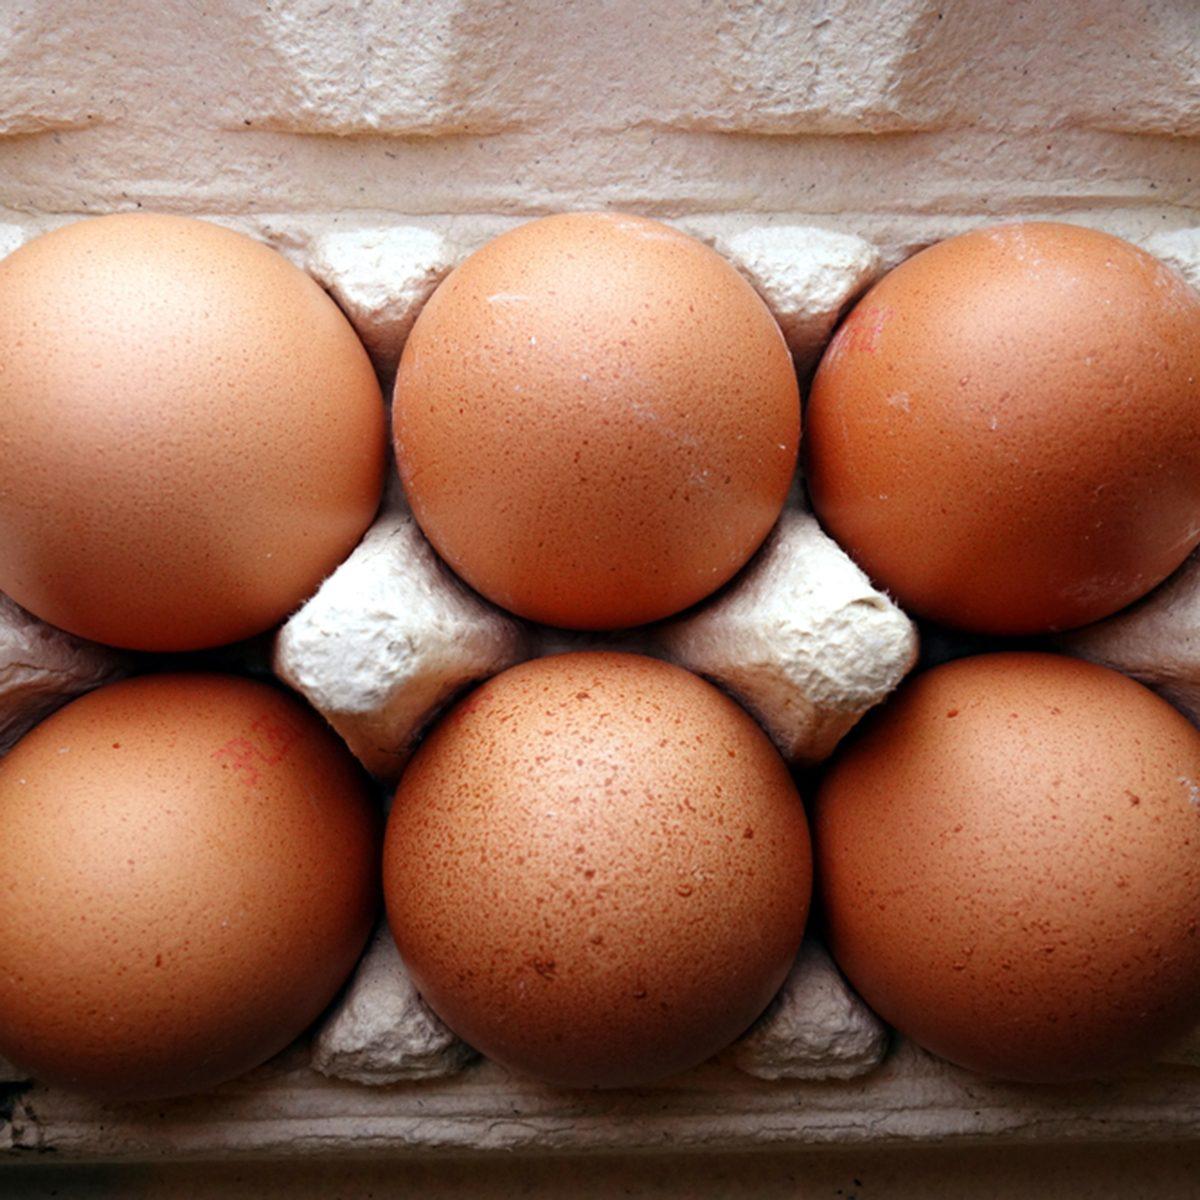 Organic eggs in a box